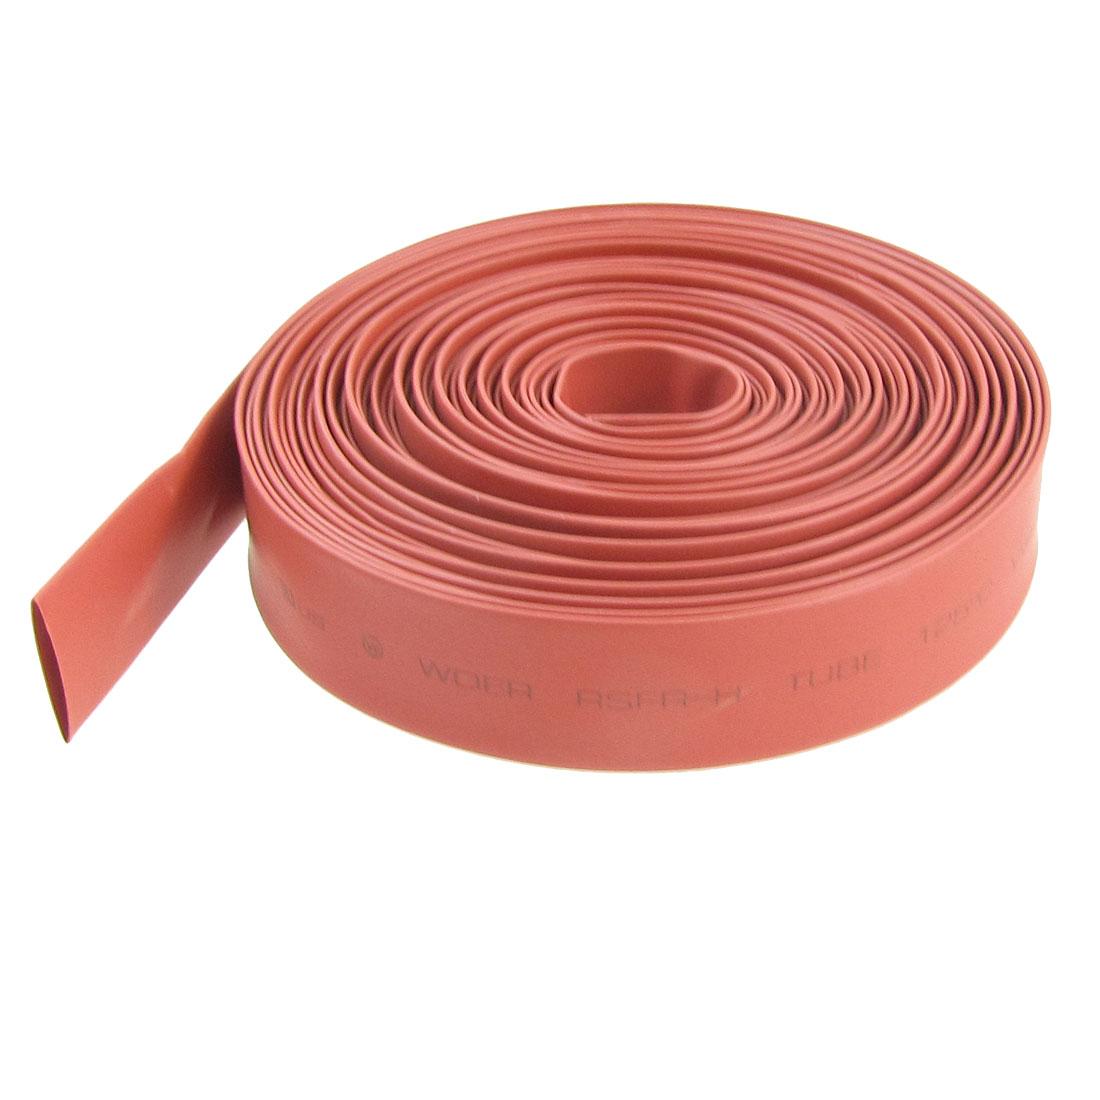 Ratio 2:1 11mm Dia. Red Heat Shrinkable Tube Shrinking Tubing 8M